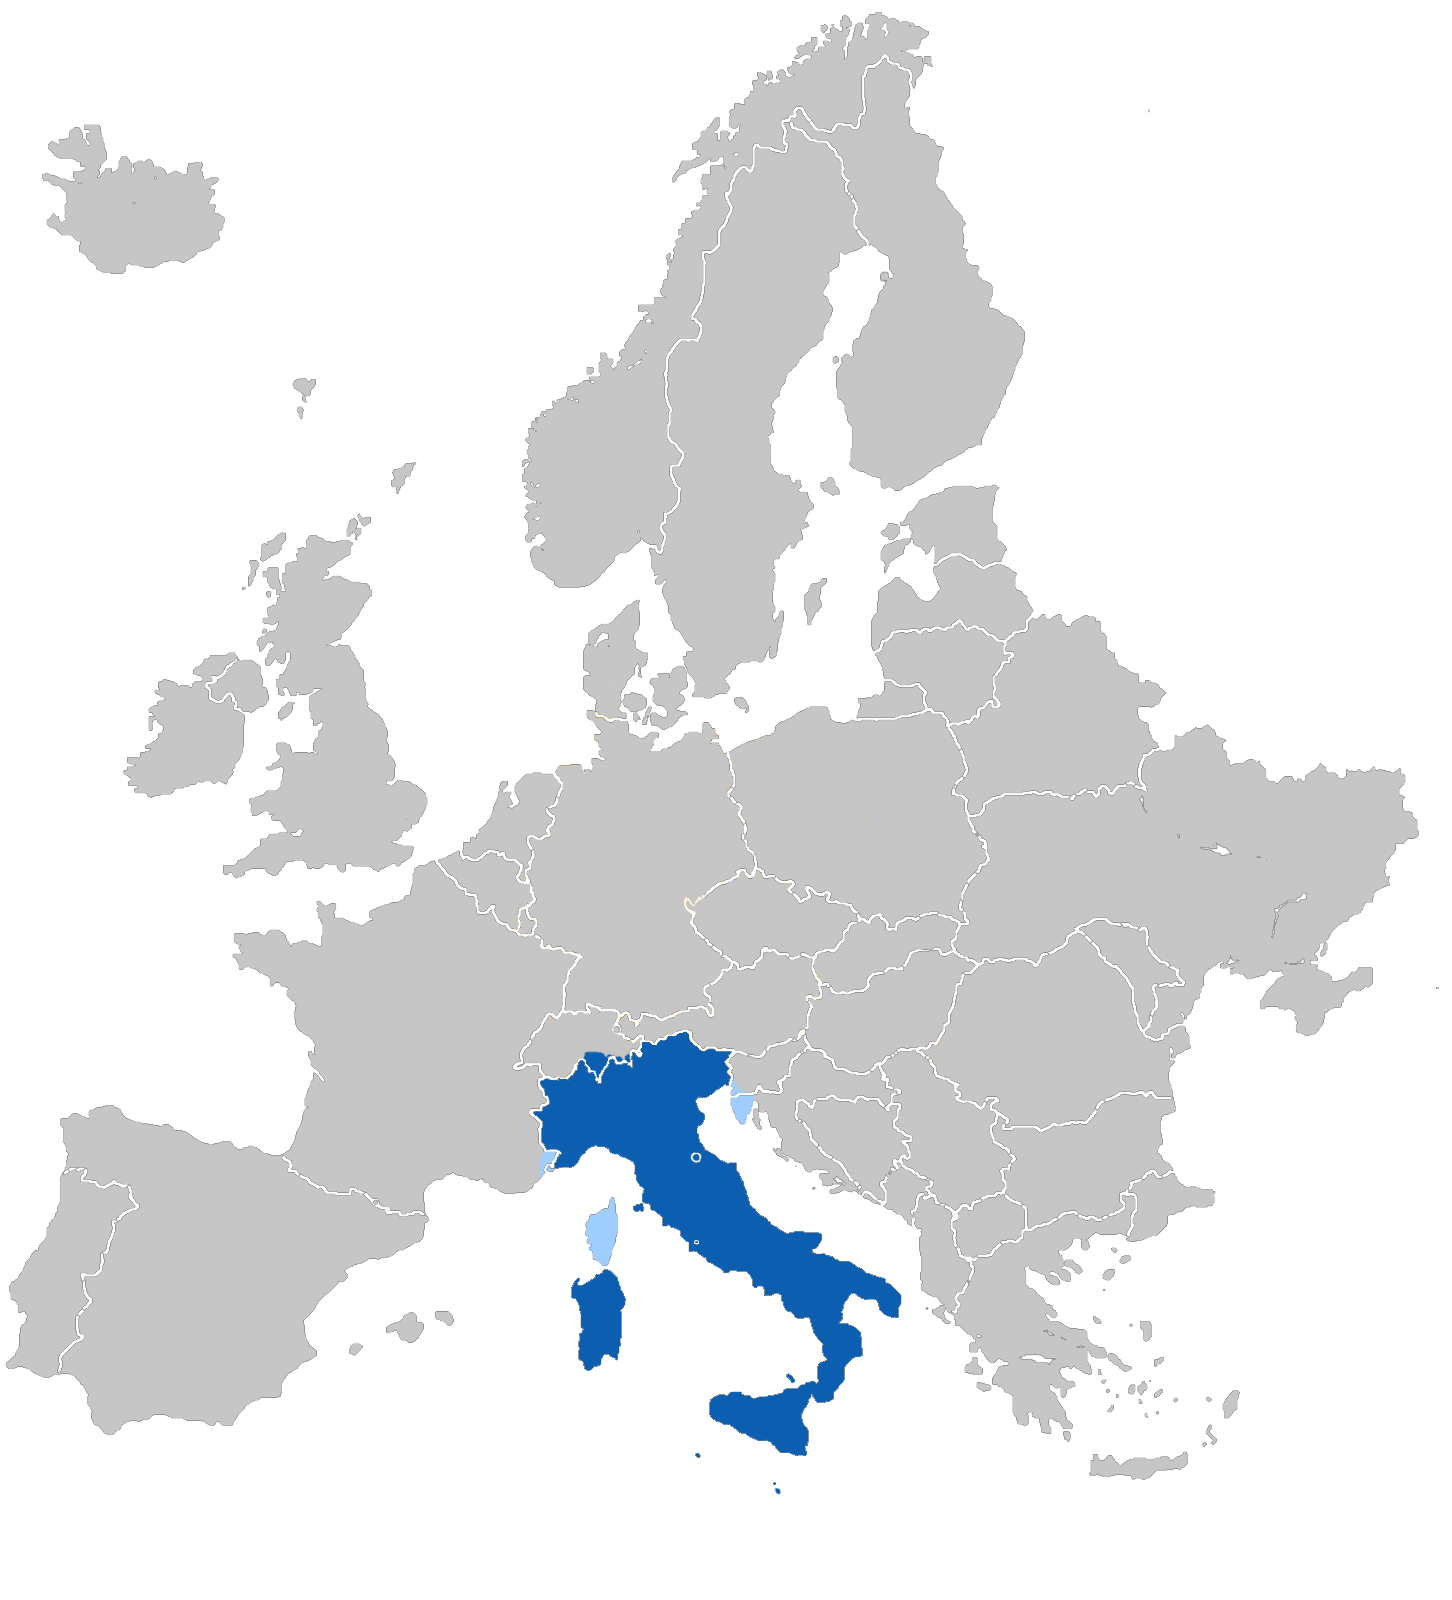 Carte Europe En Italien.Europe Italien Langue Carte Populationdata Net